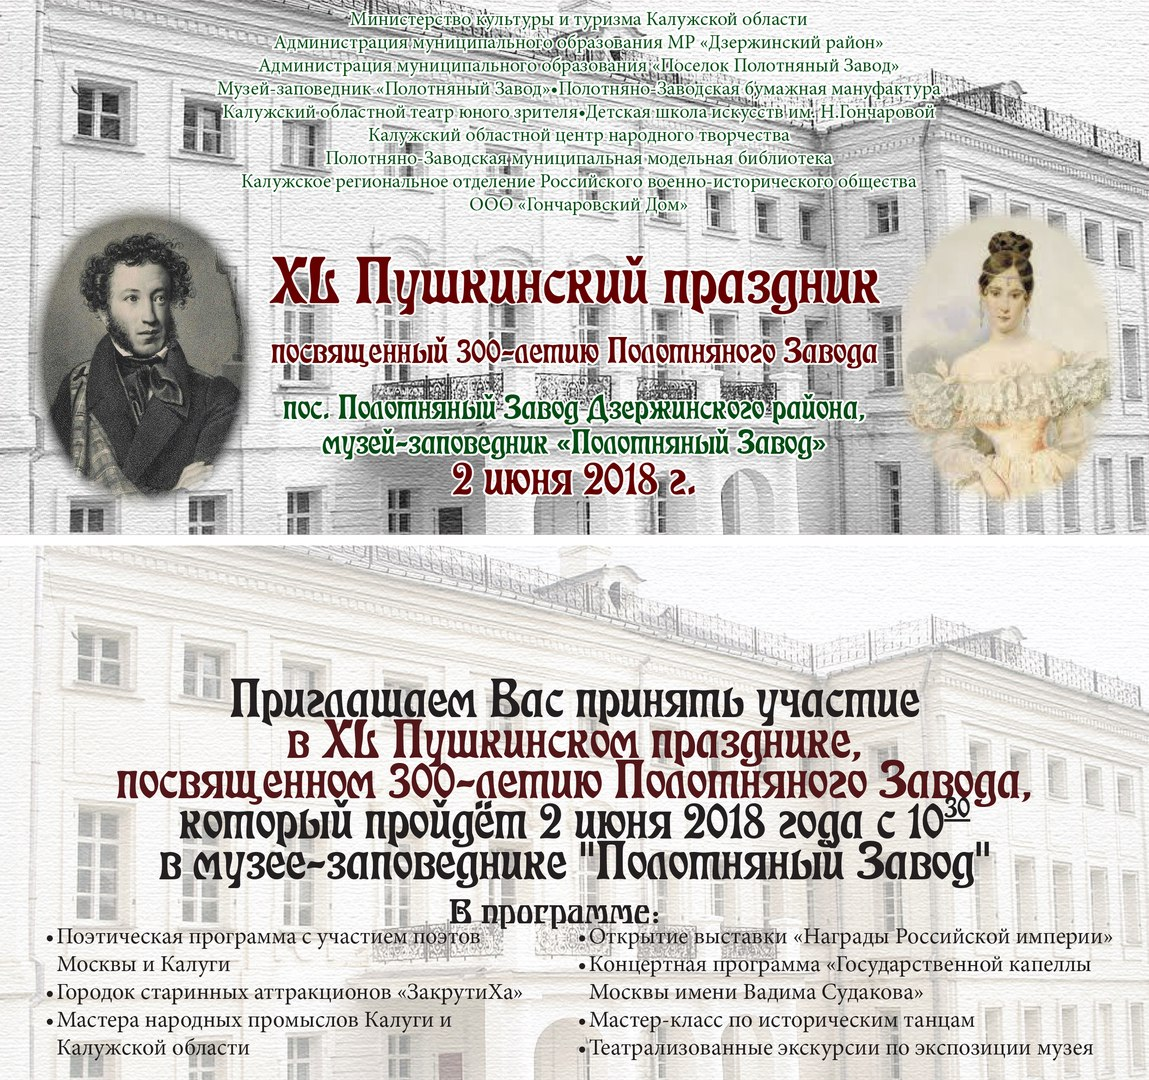 Юбилейный Пушкинский праздник